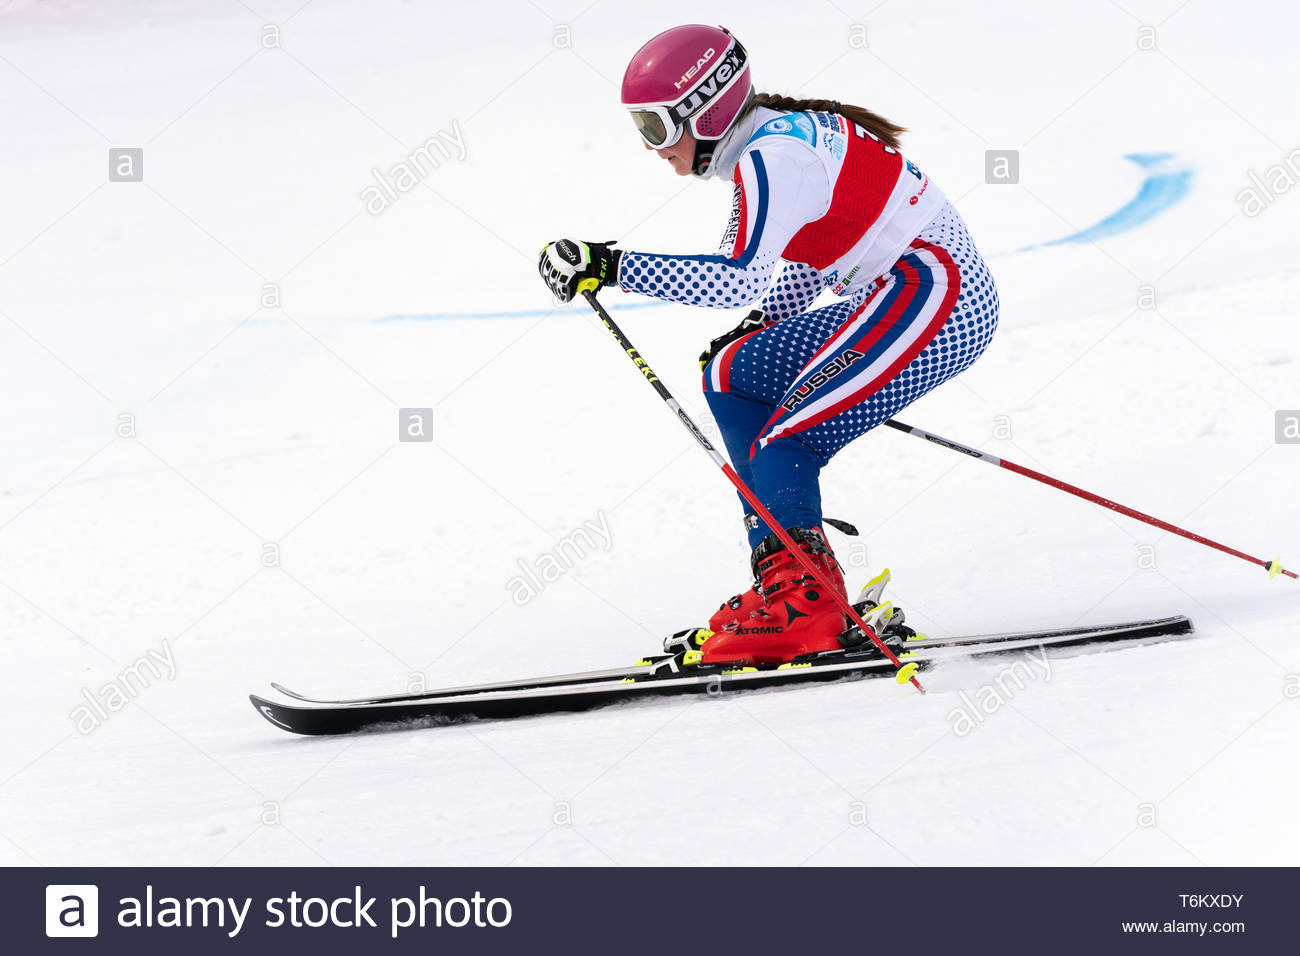 KAMCHATKA PENINSULA, RUSSIA - APR 2, 2019: Mountain skier Darya Kryukova (Chelyabinsk) skiing down mount slope. International Ski Federation Champions - Stock Image